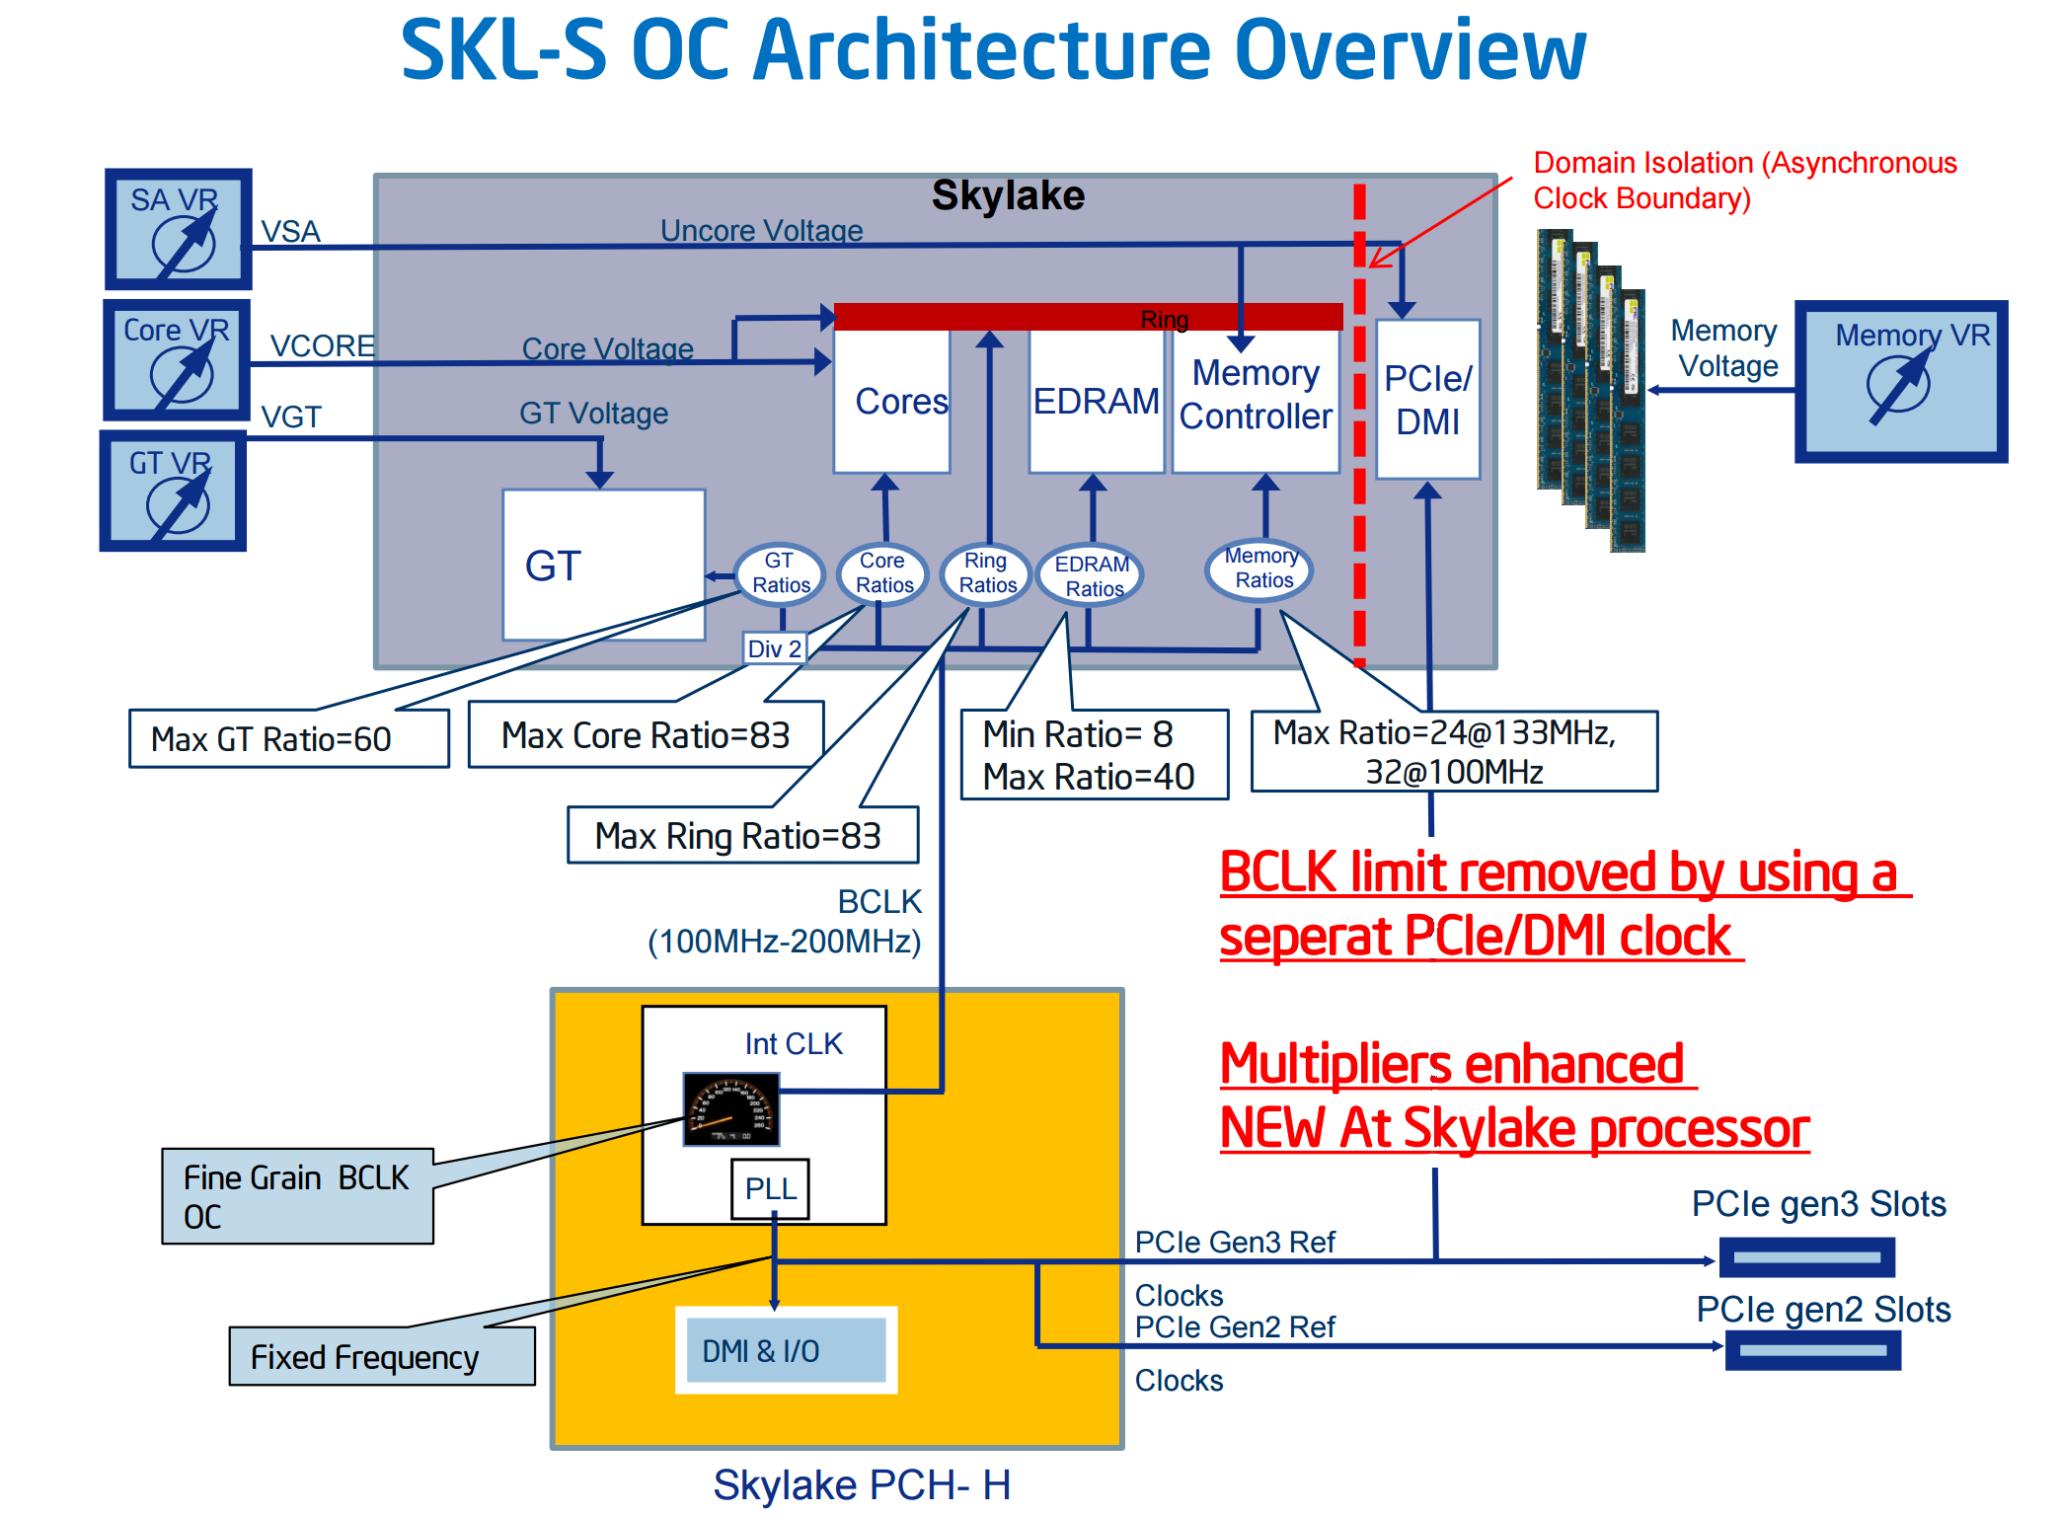 skylake-s-oc-architecture